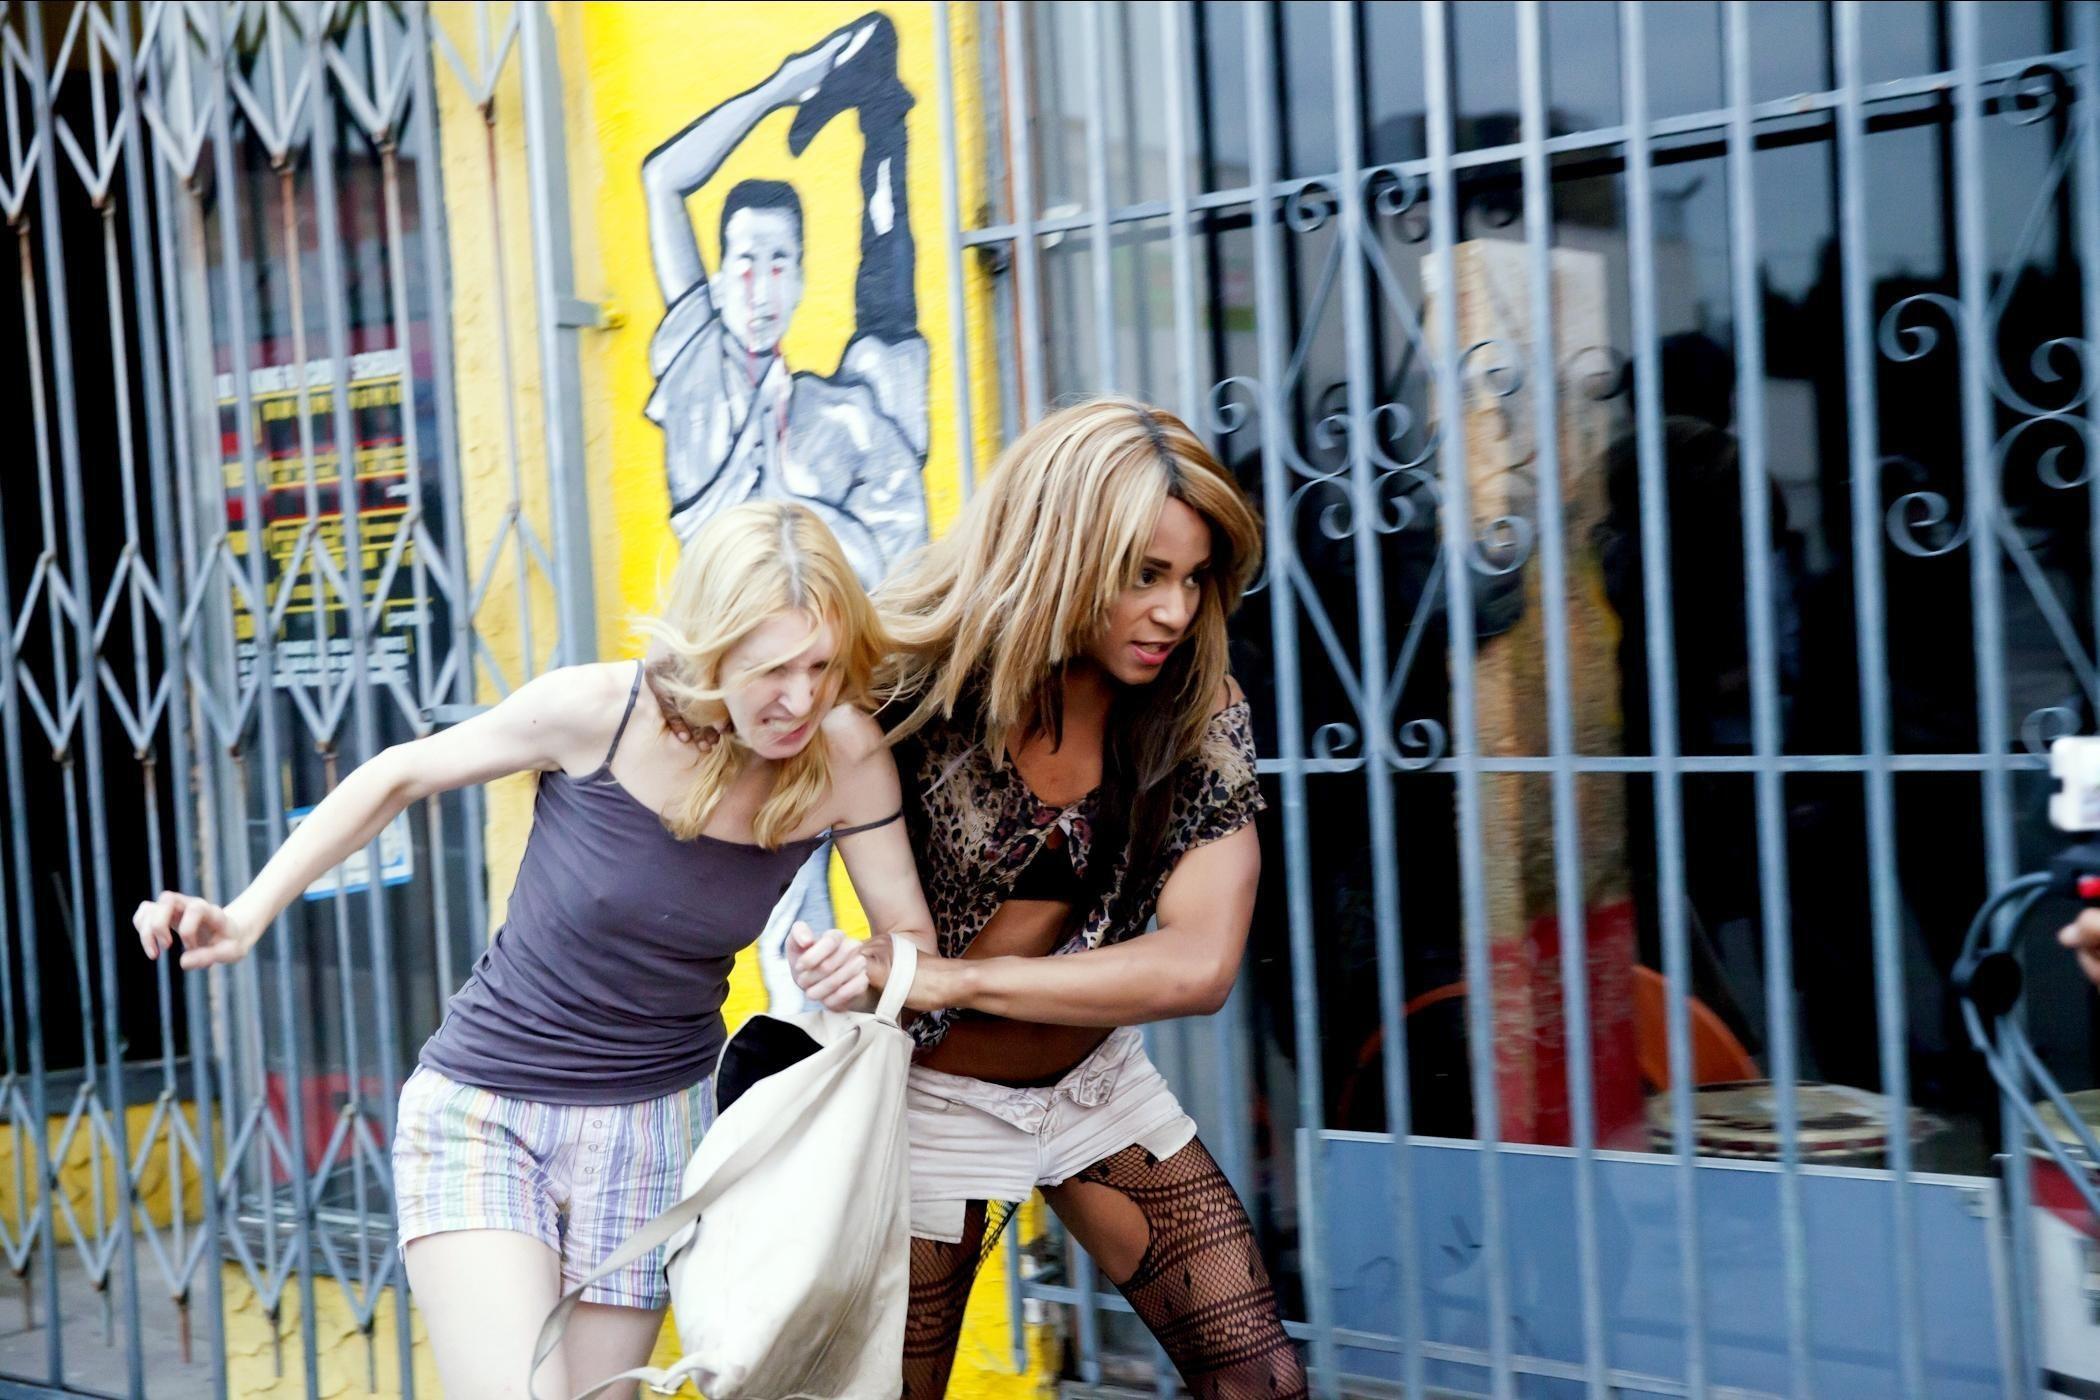 Kitana Kiki Rodriguez drags Mickey O'Hagan down the street by the neck